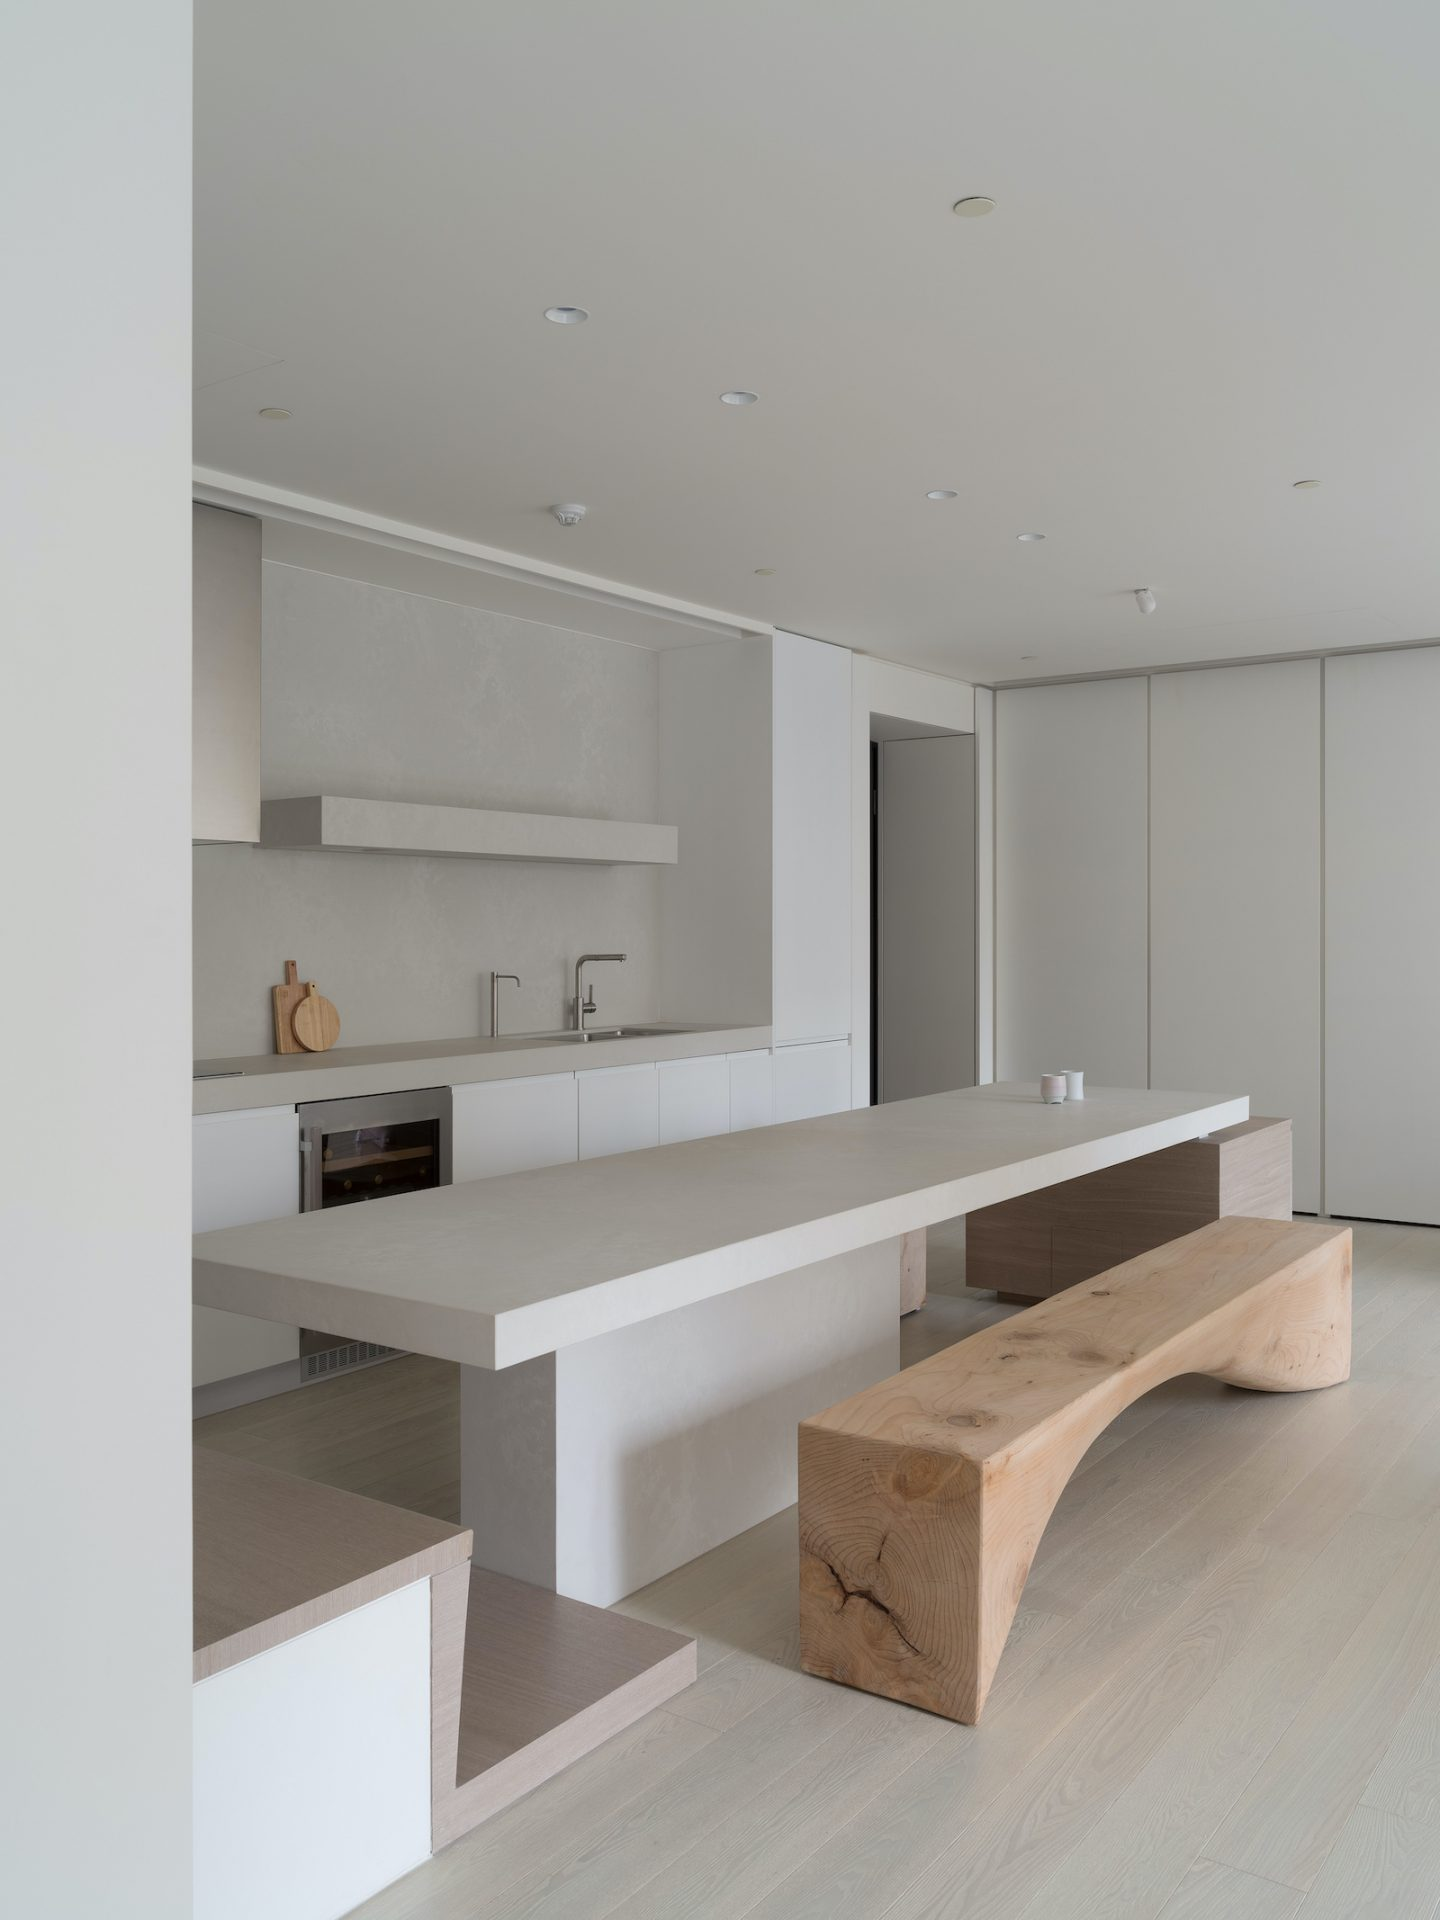 IGNANT-Architecture-Marty-Chou-KOA-Apartment-012